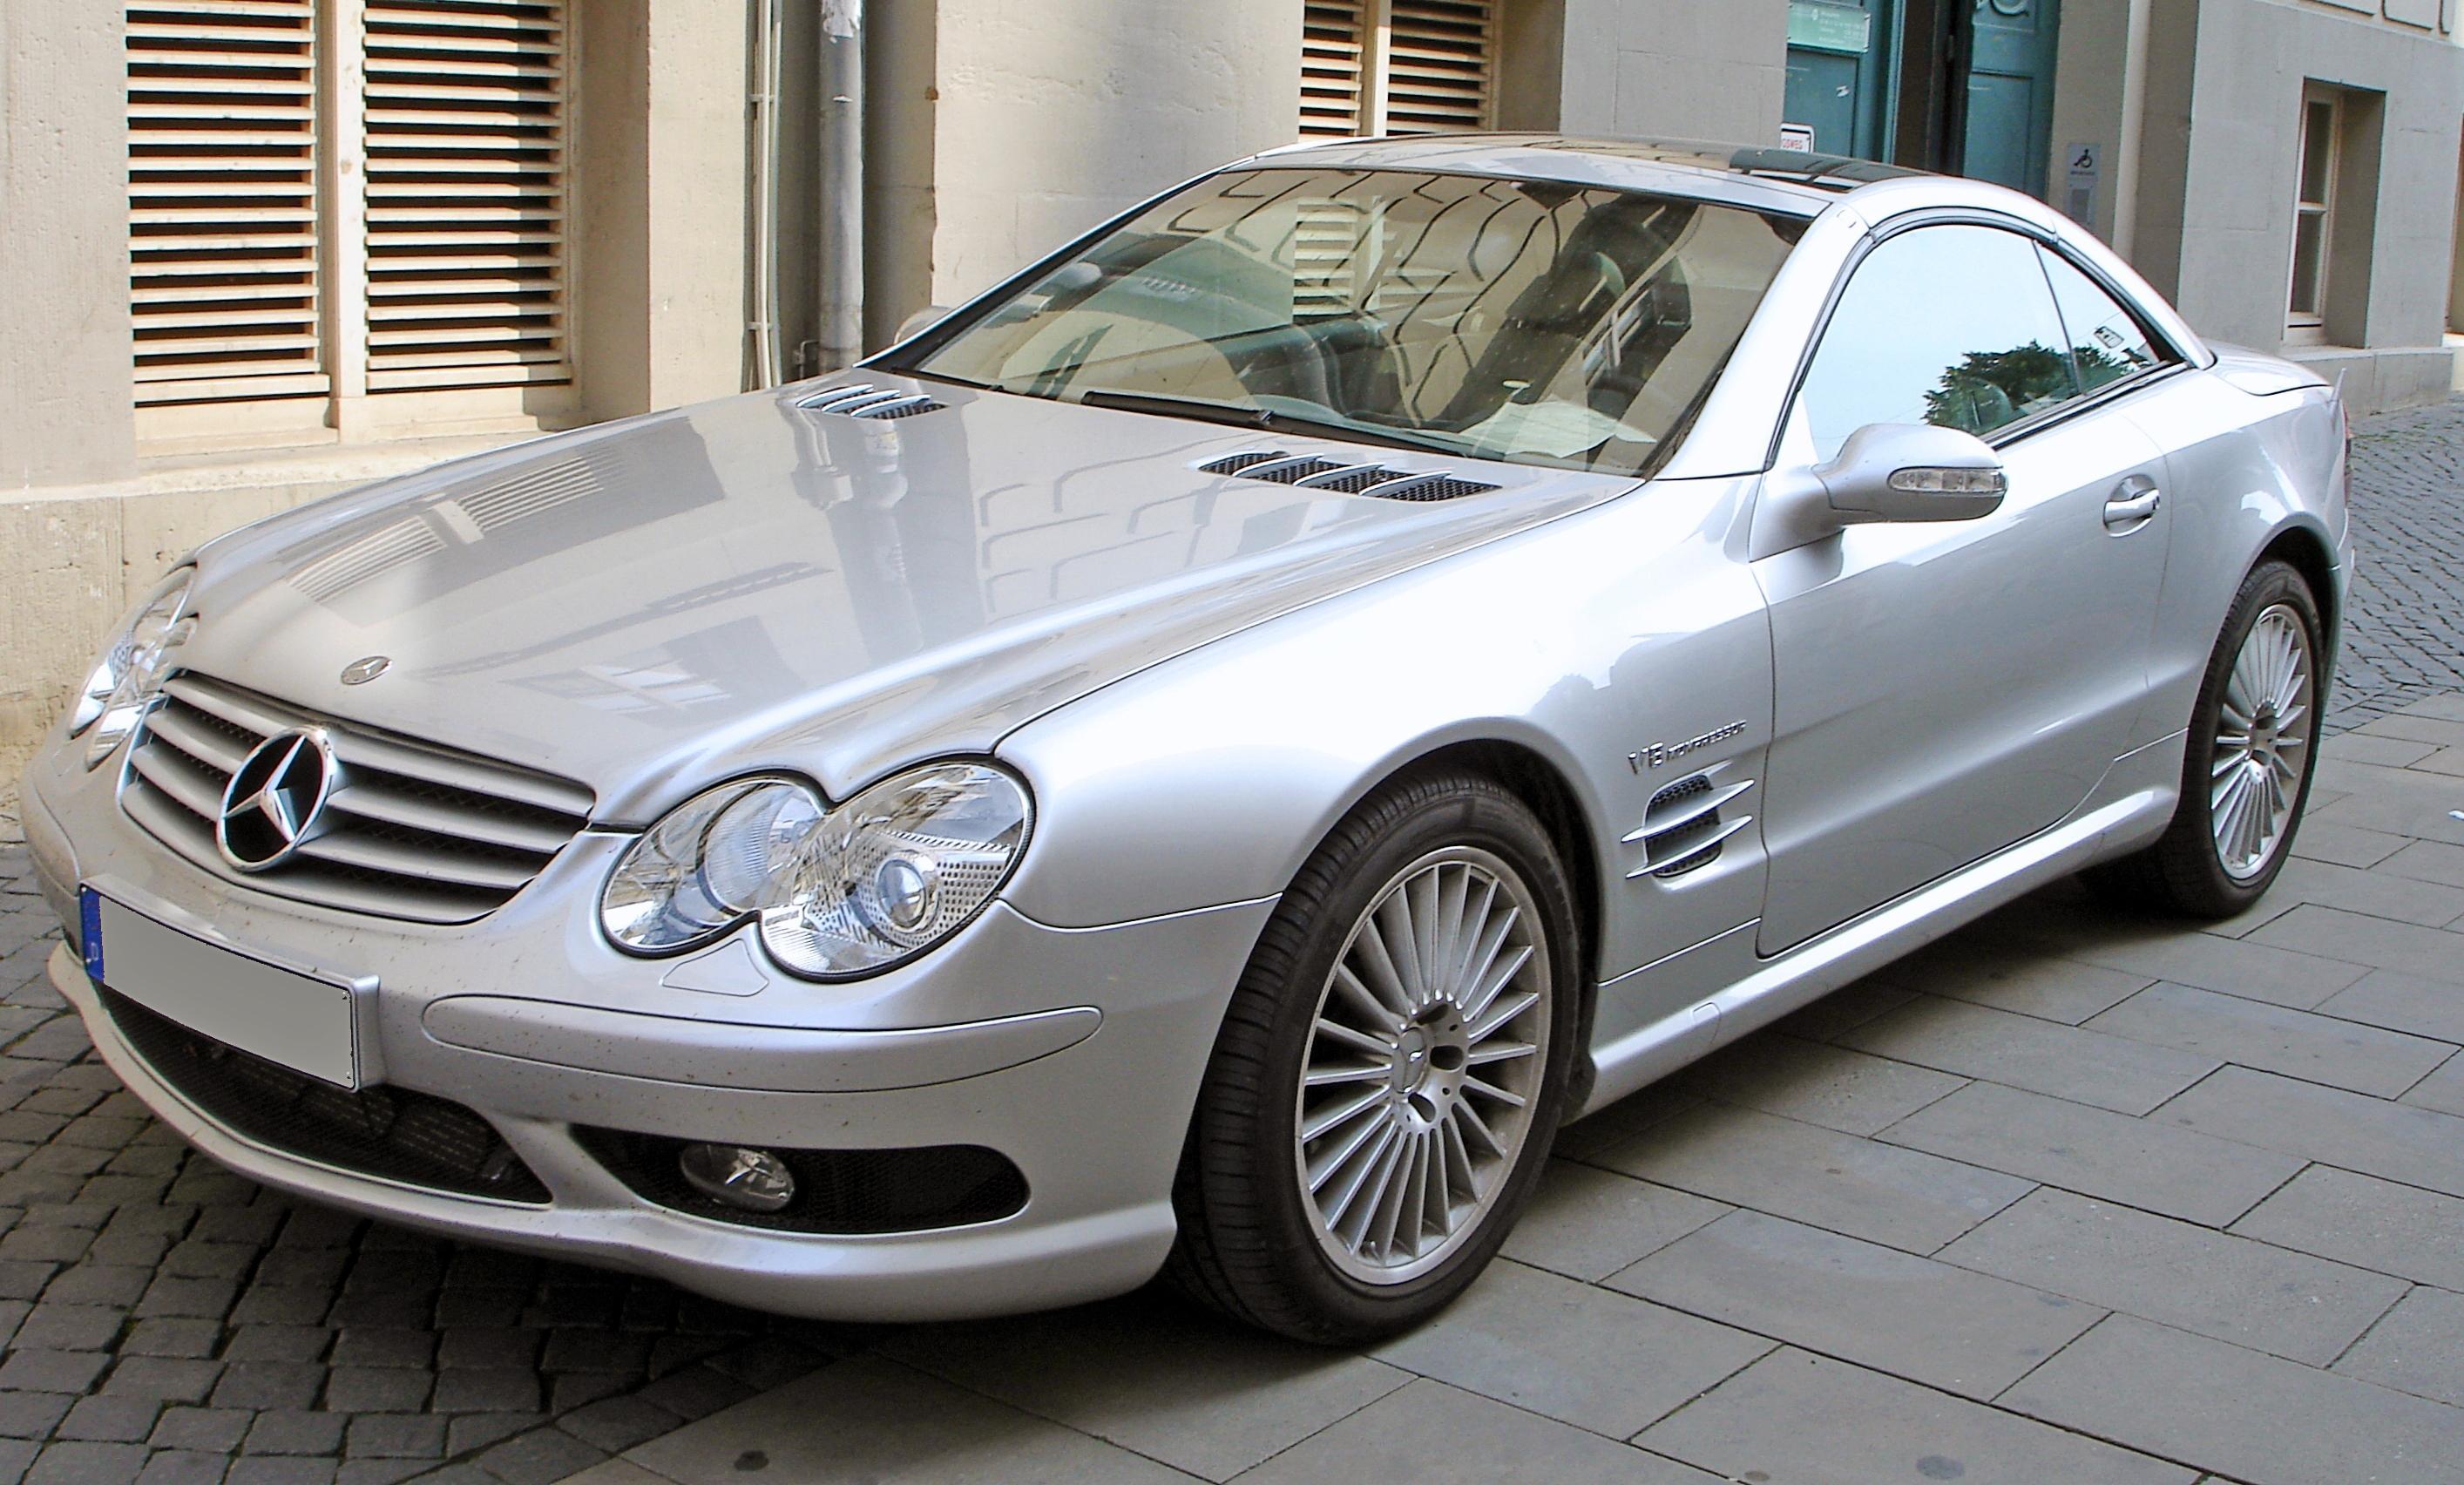 SL55 AMG car - Color: Silver  // Description: sophisticated sporty